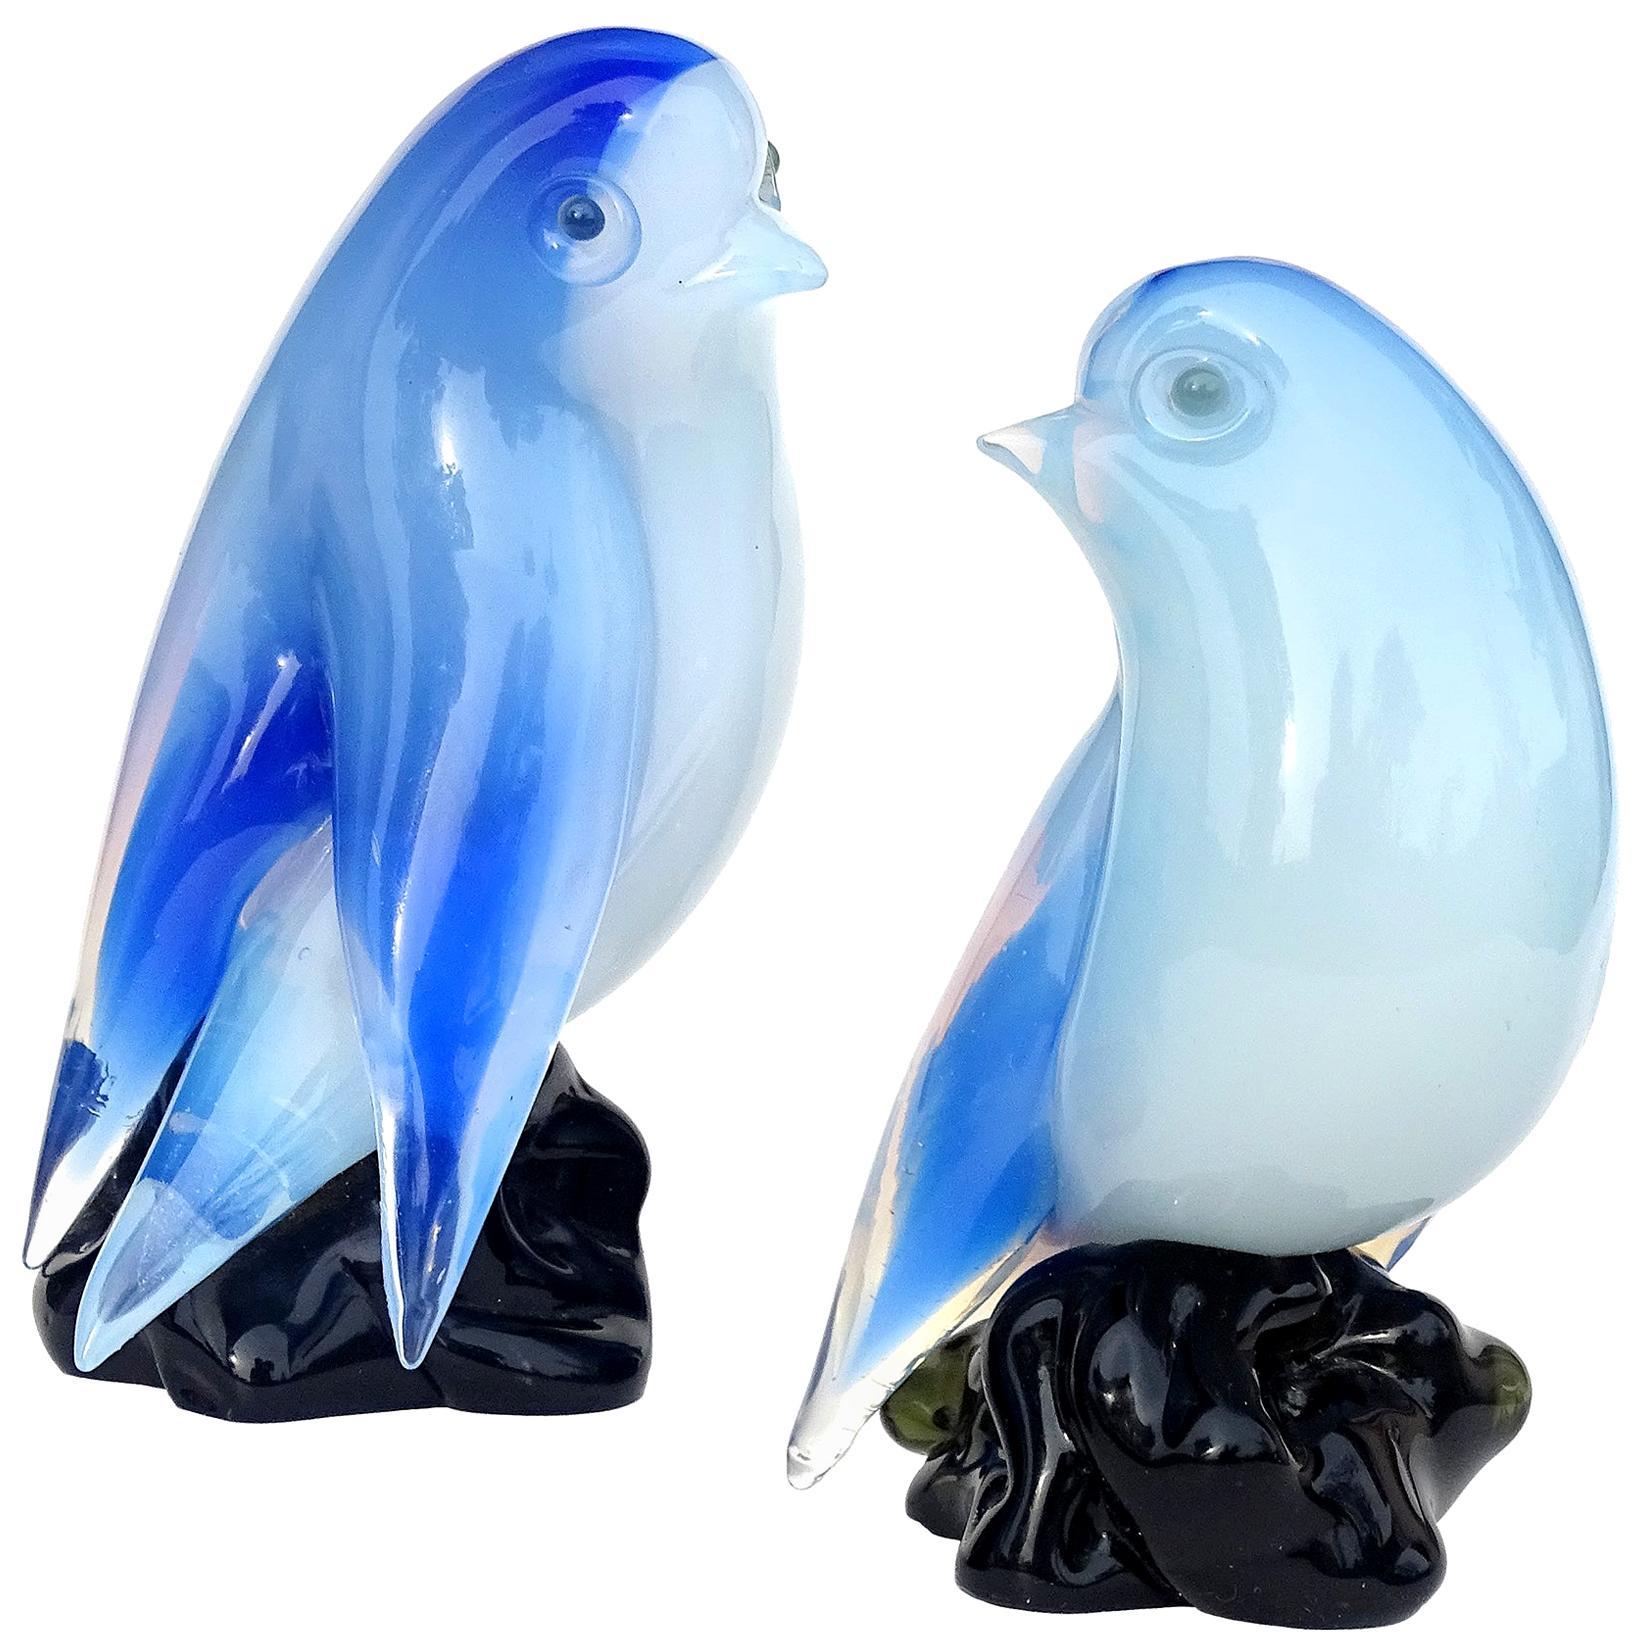 Seguso Murano Vintage Opal White Blue Italian Art Glass Bird Figurine Sculpture